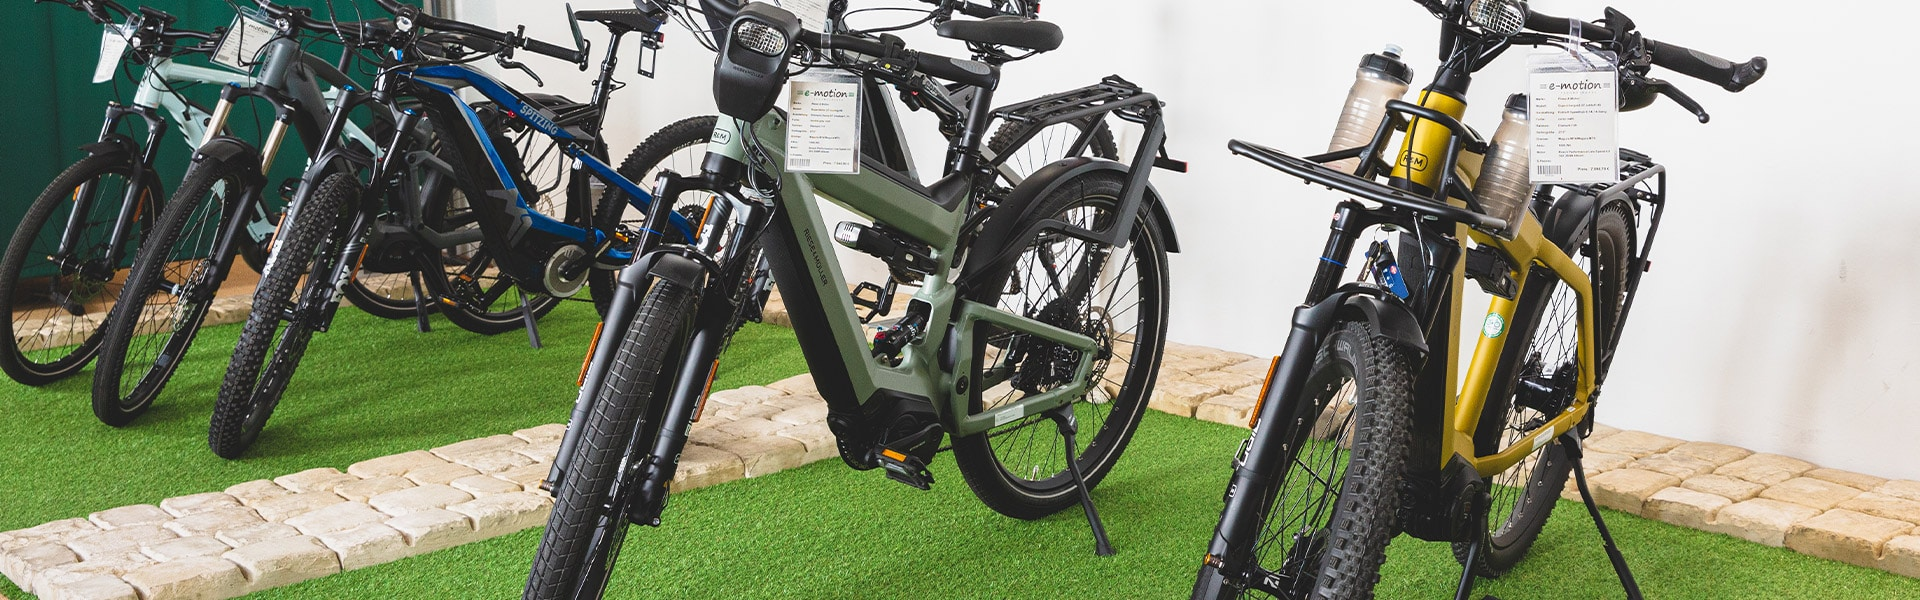 Der Shop der e-motion e-Bike Welt Worms